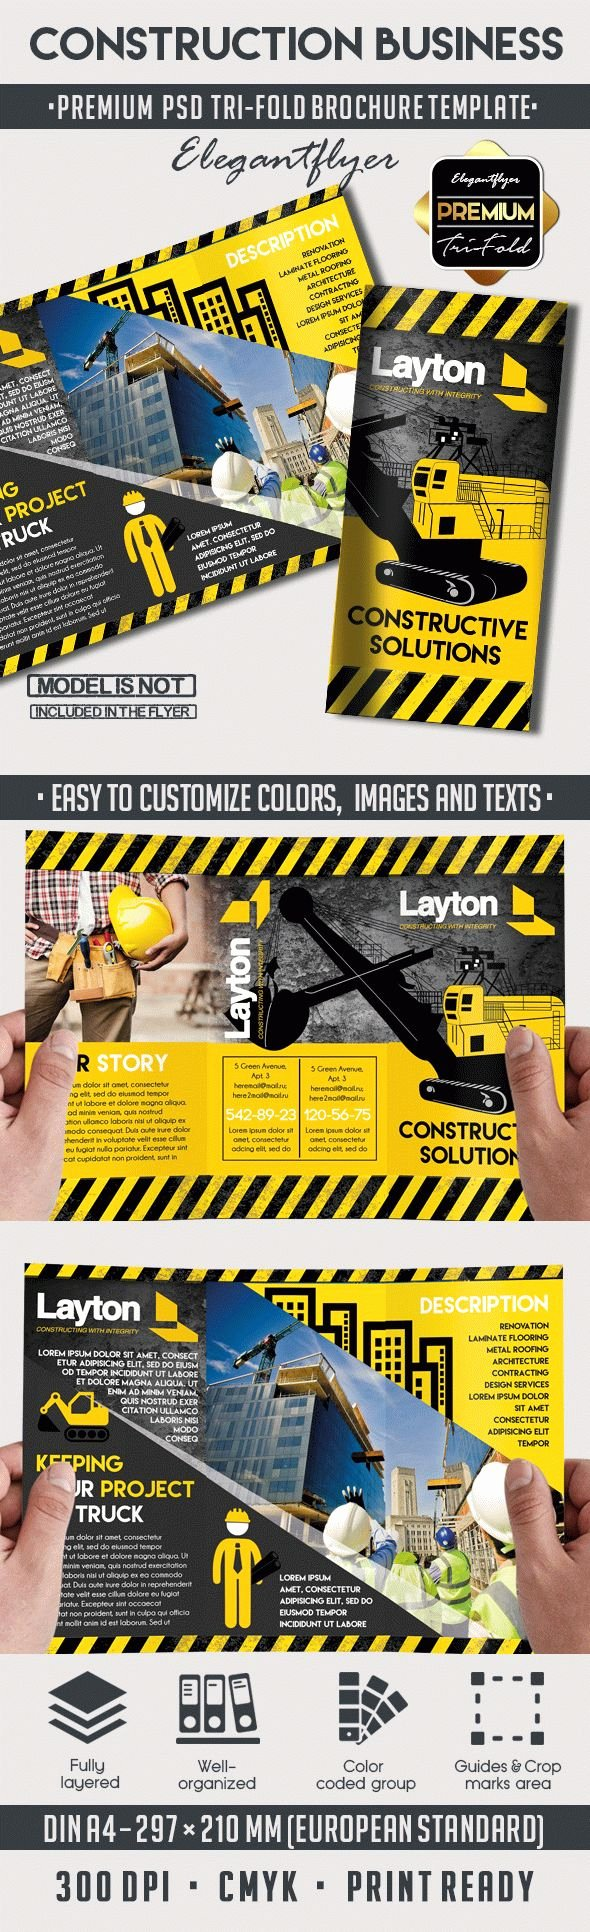 Tri Fold Brochure for Construction Business – by Elegantflyer